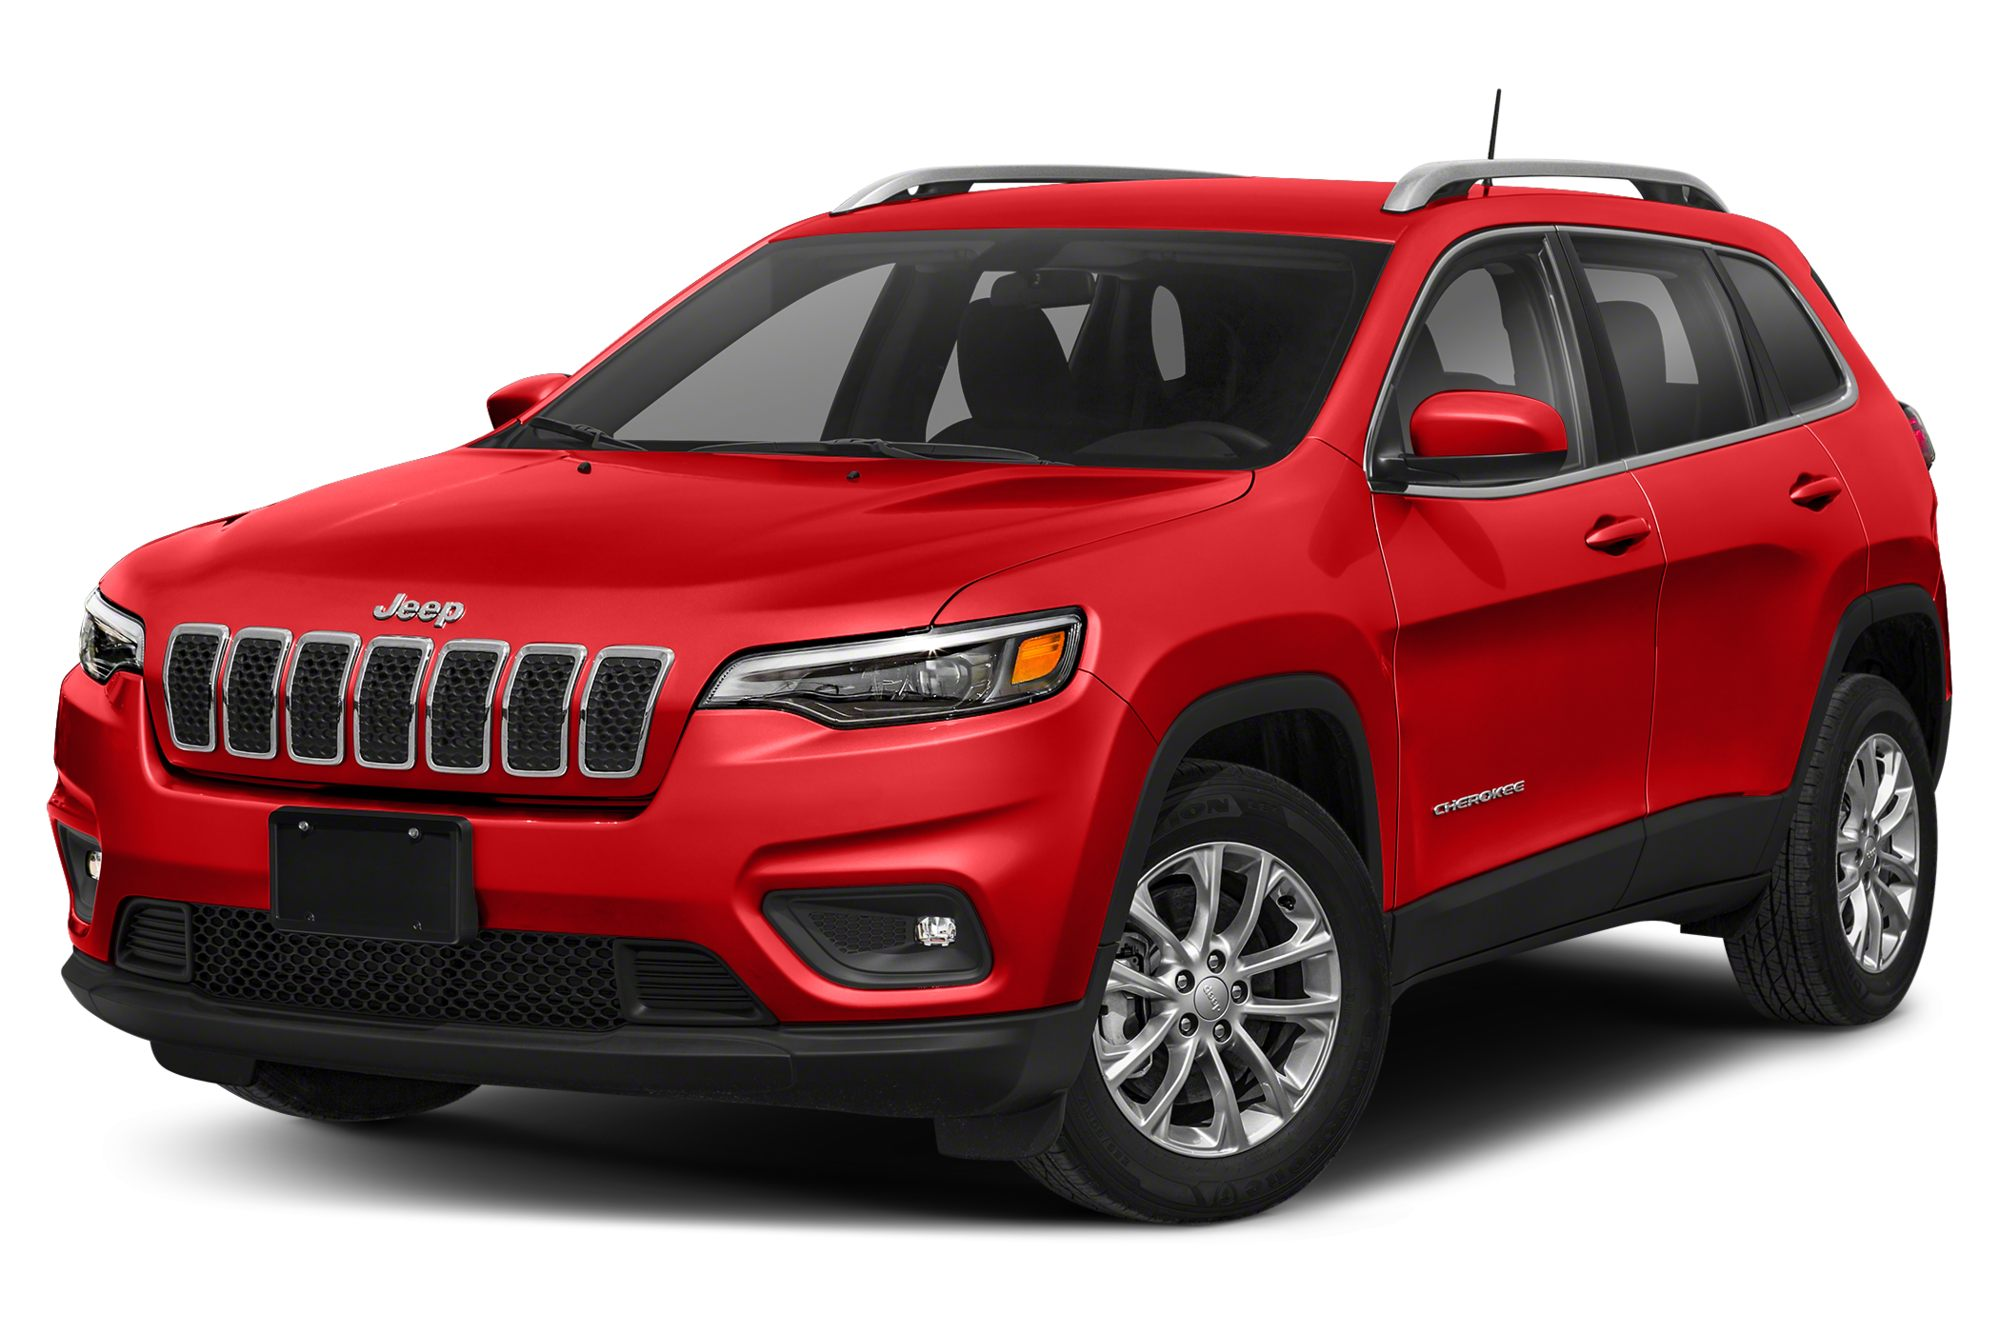 2019-2020 Jeep Cherokee: Recall Alert